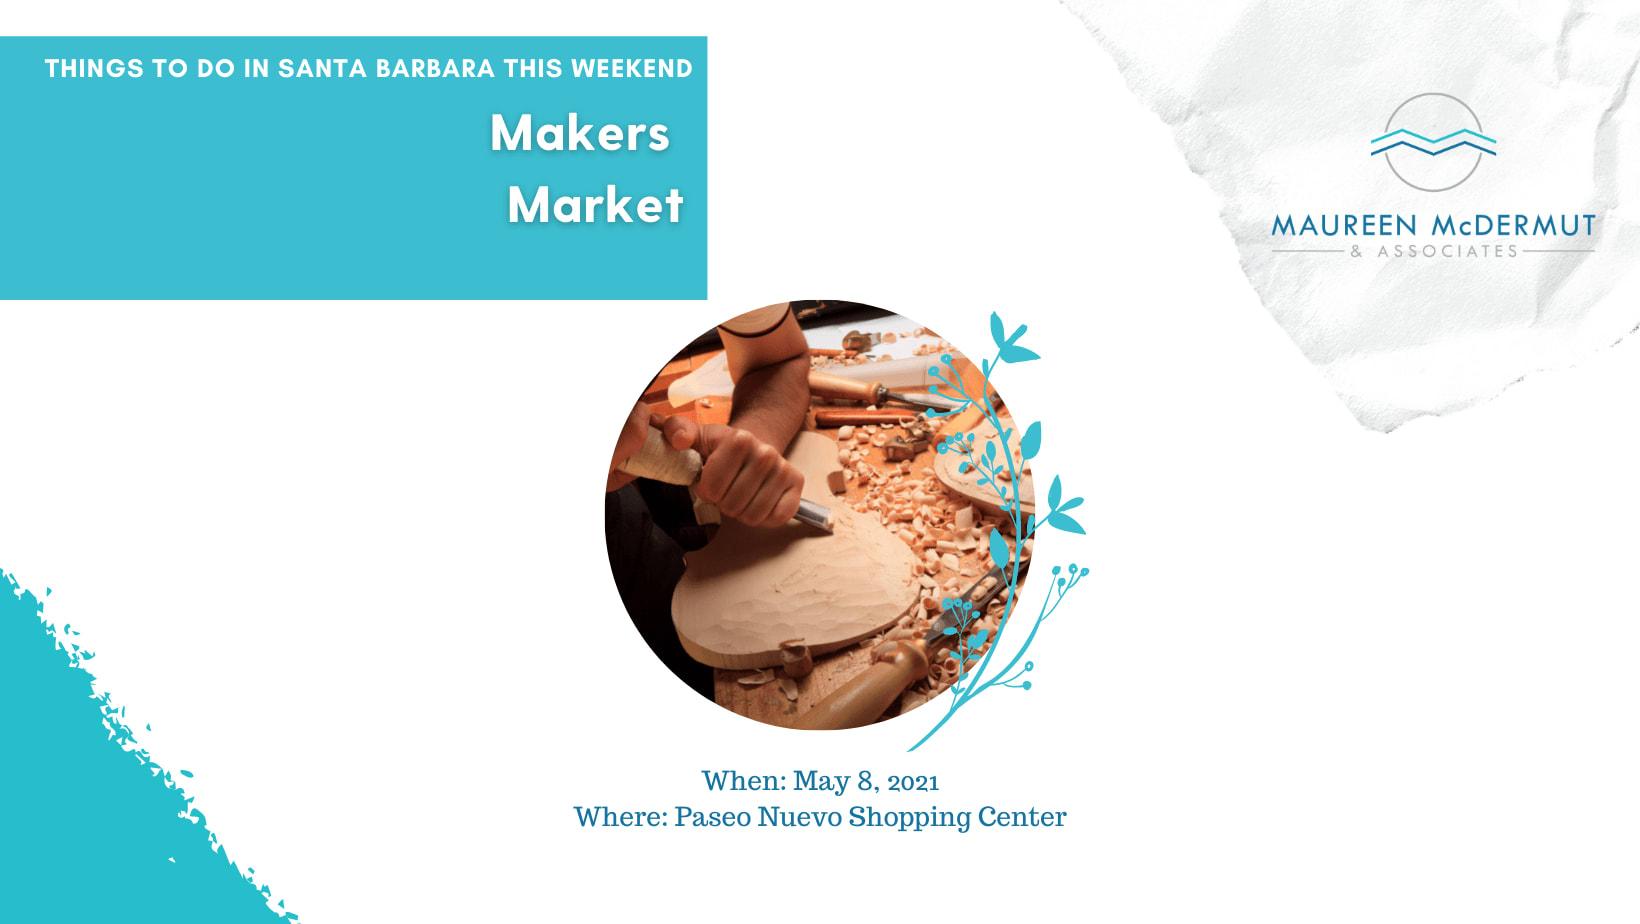 Makers Market image